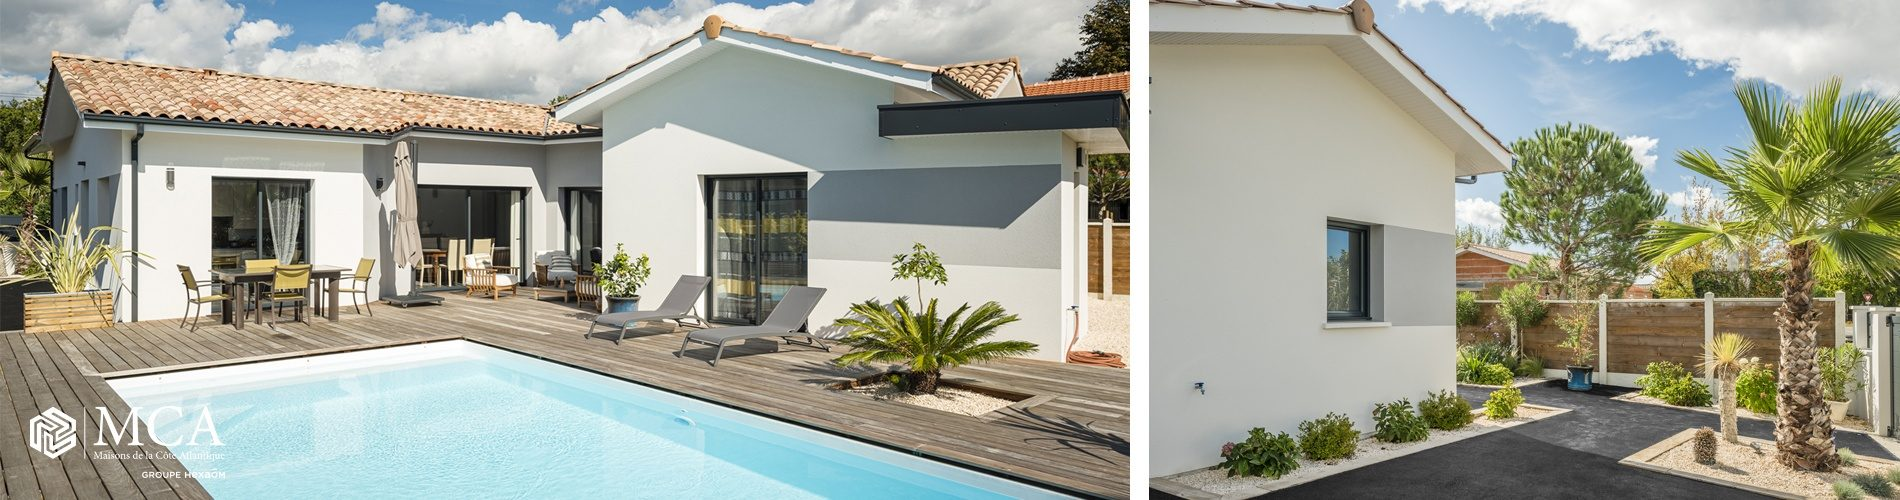 Villa avec piscine à Andernos